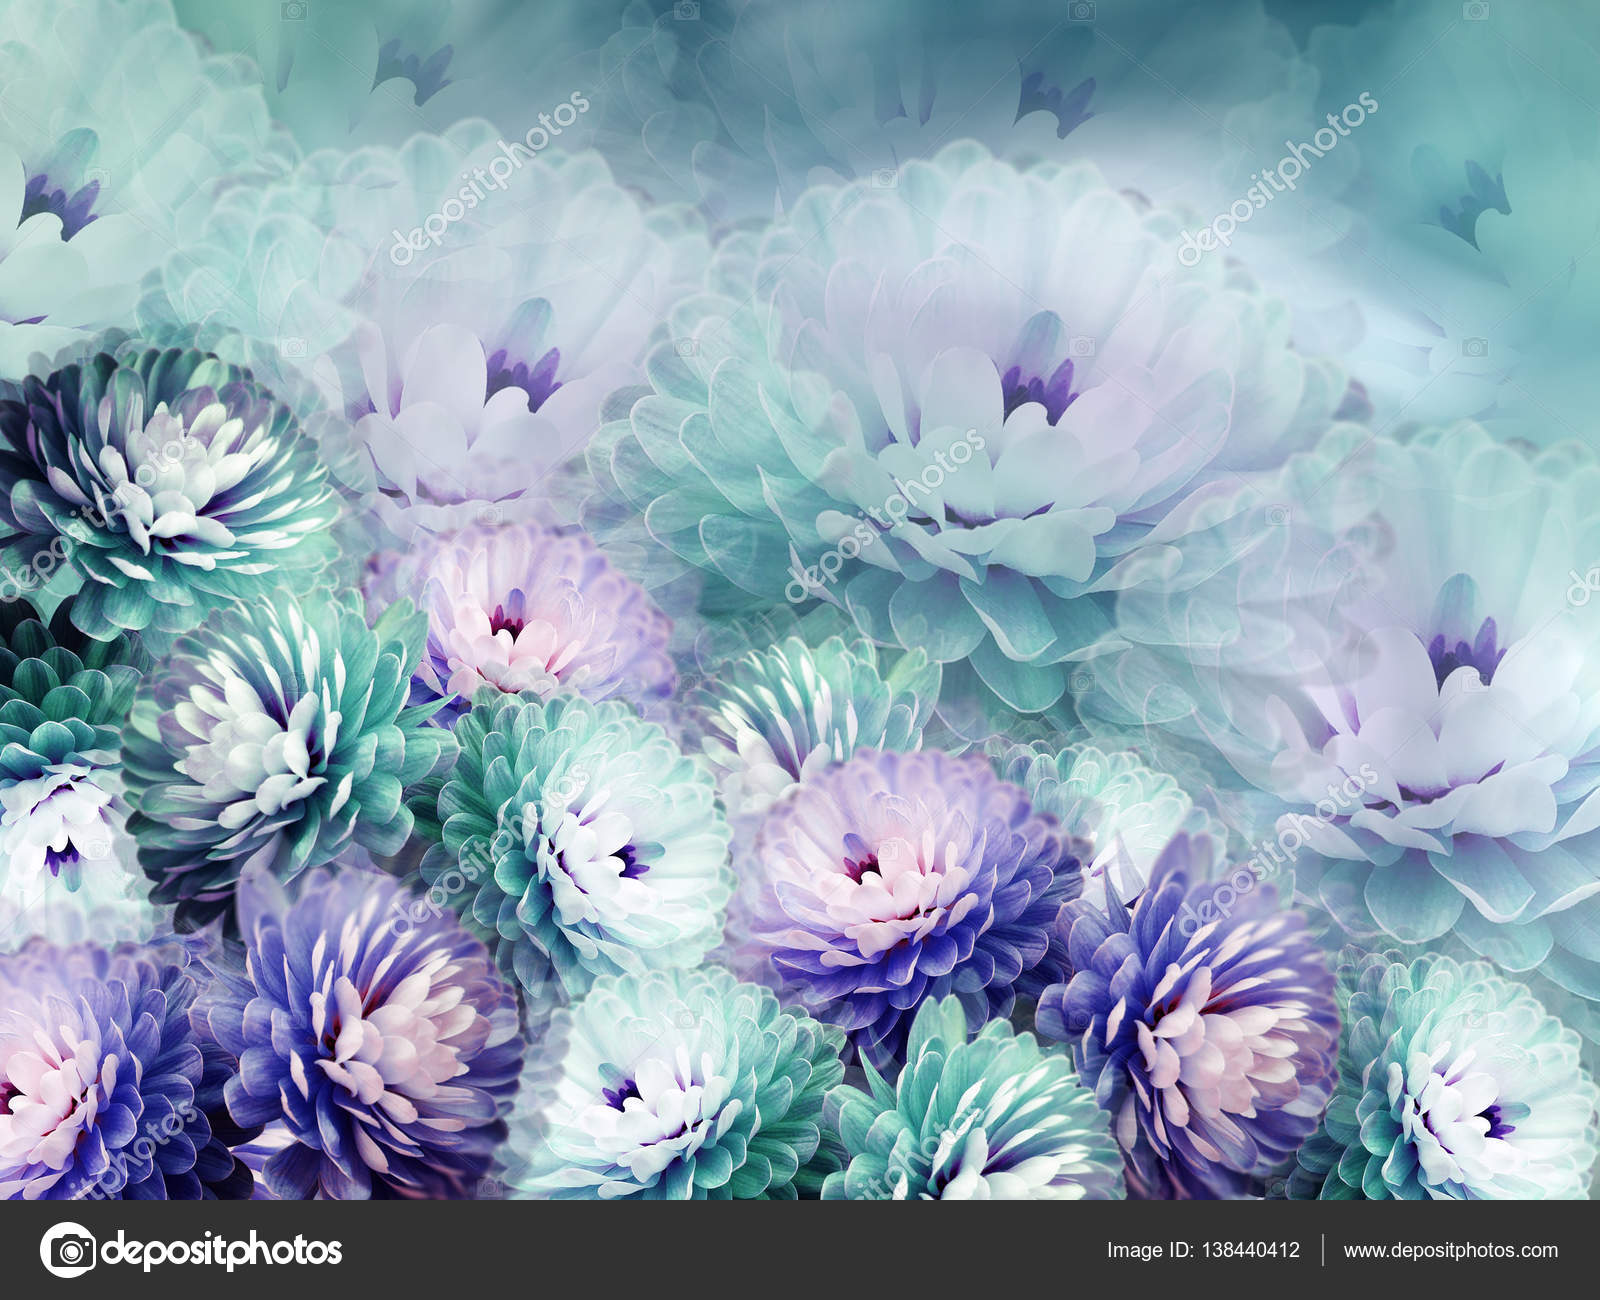 Flowers chrysanthemum on blurry background turquoise blue violet flowers chrysanthemum on blurry background turquoise blue violet background floral collage izmirmasajfo